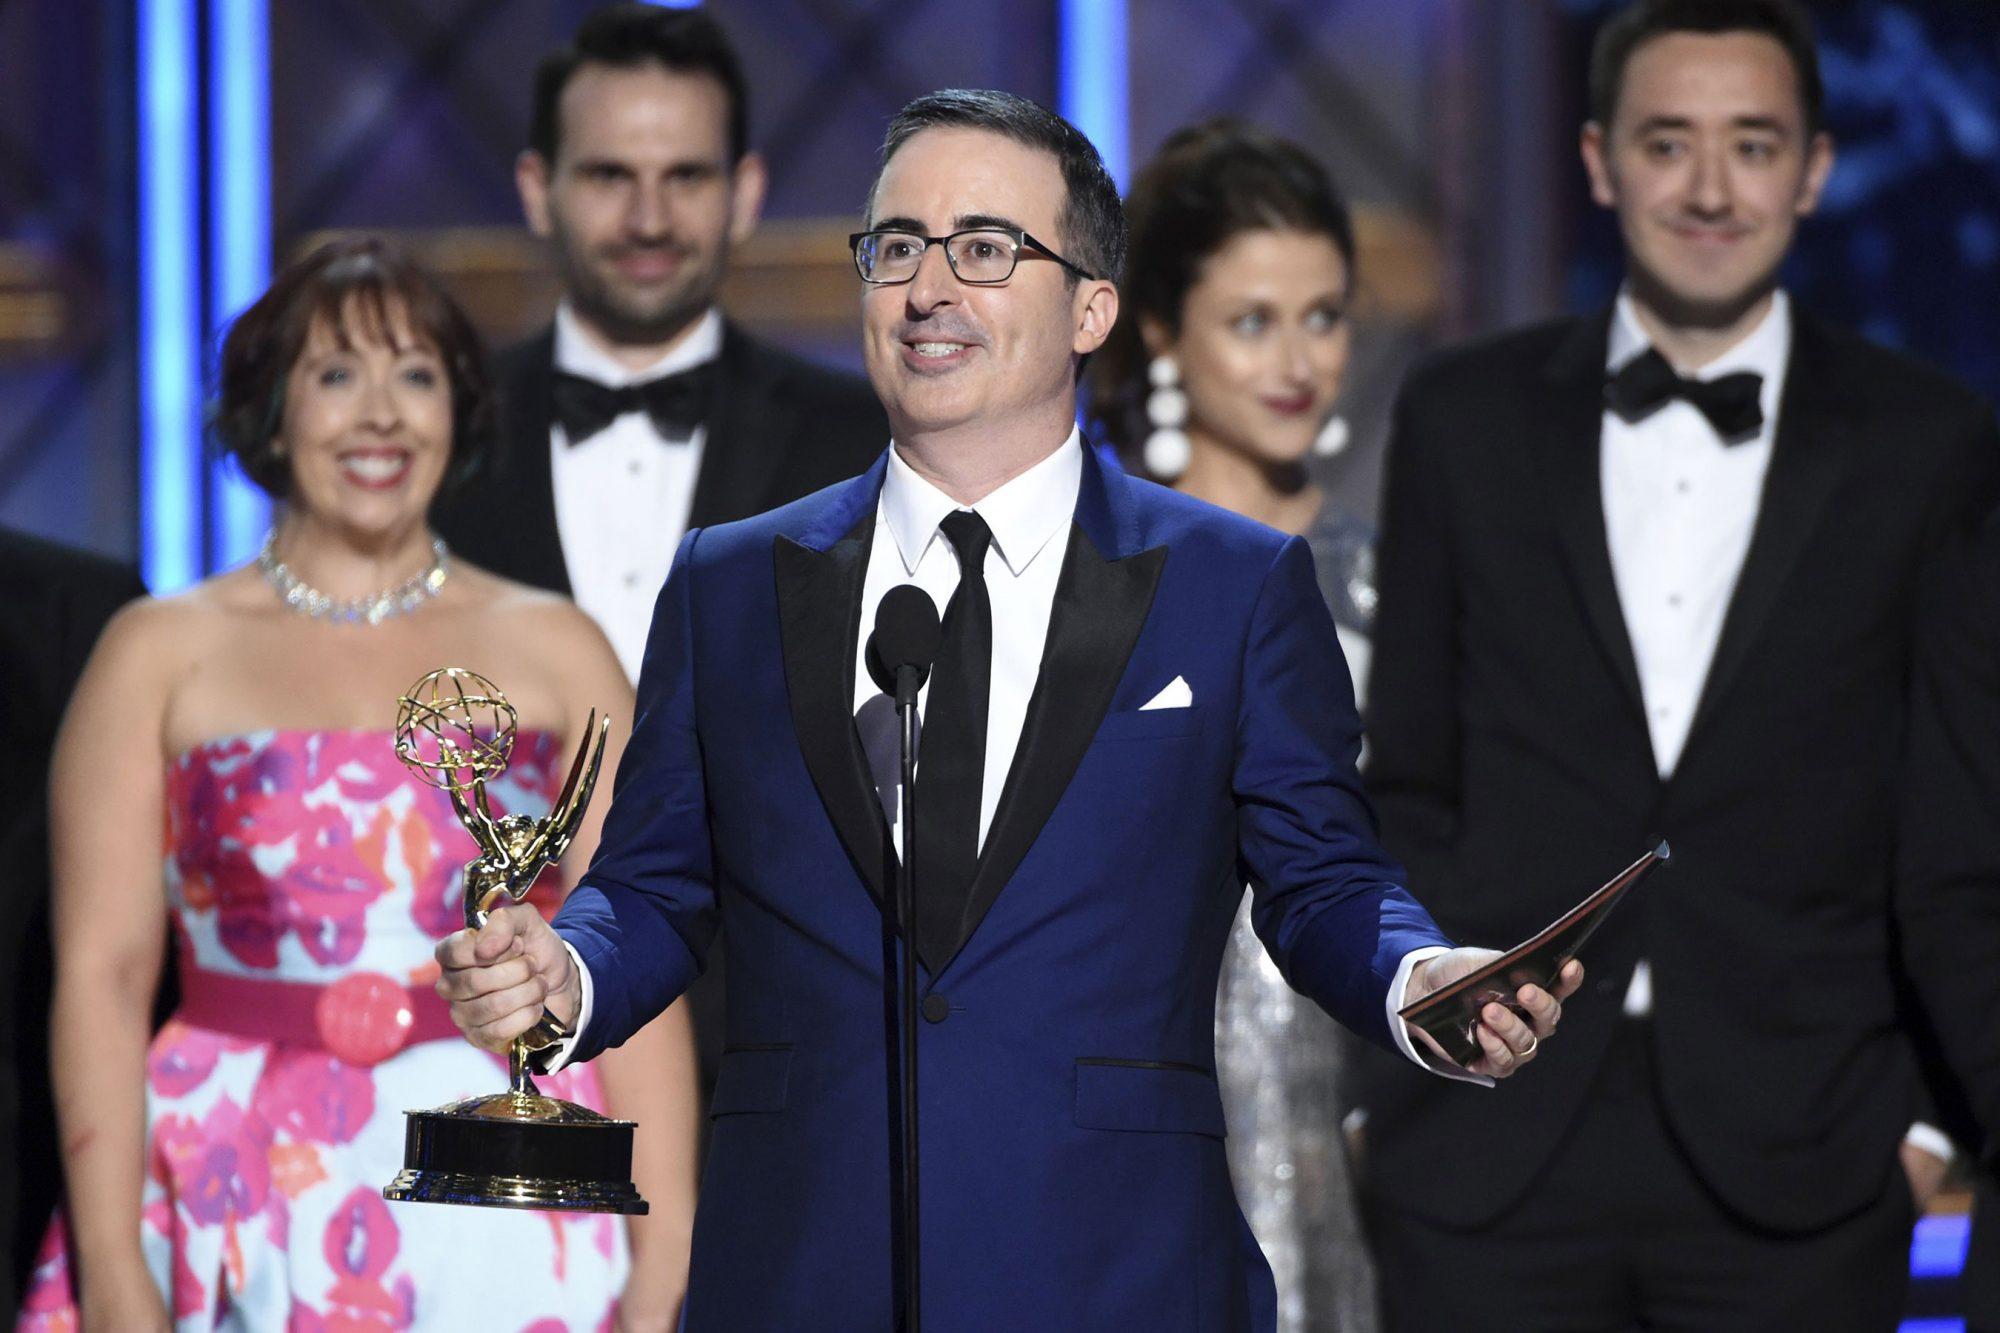 69th Primetime Emmy Awards - Show, Los Angeles, USA - 17 Sep 2017